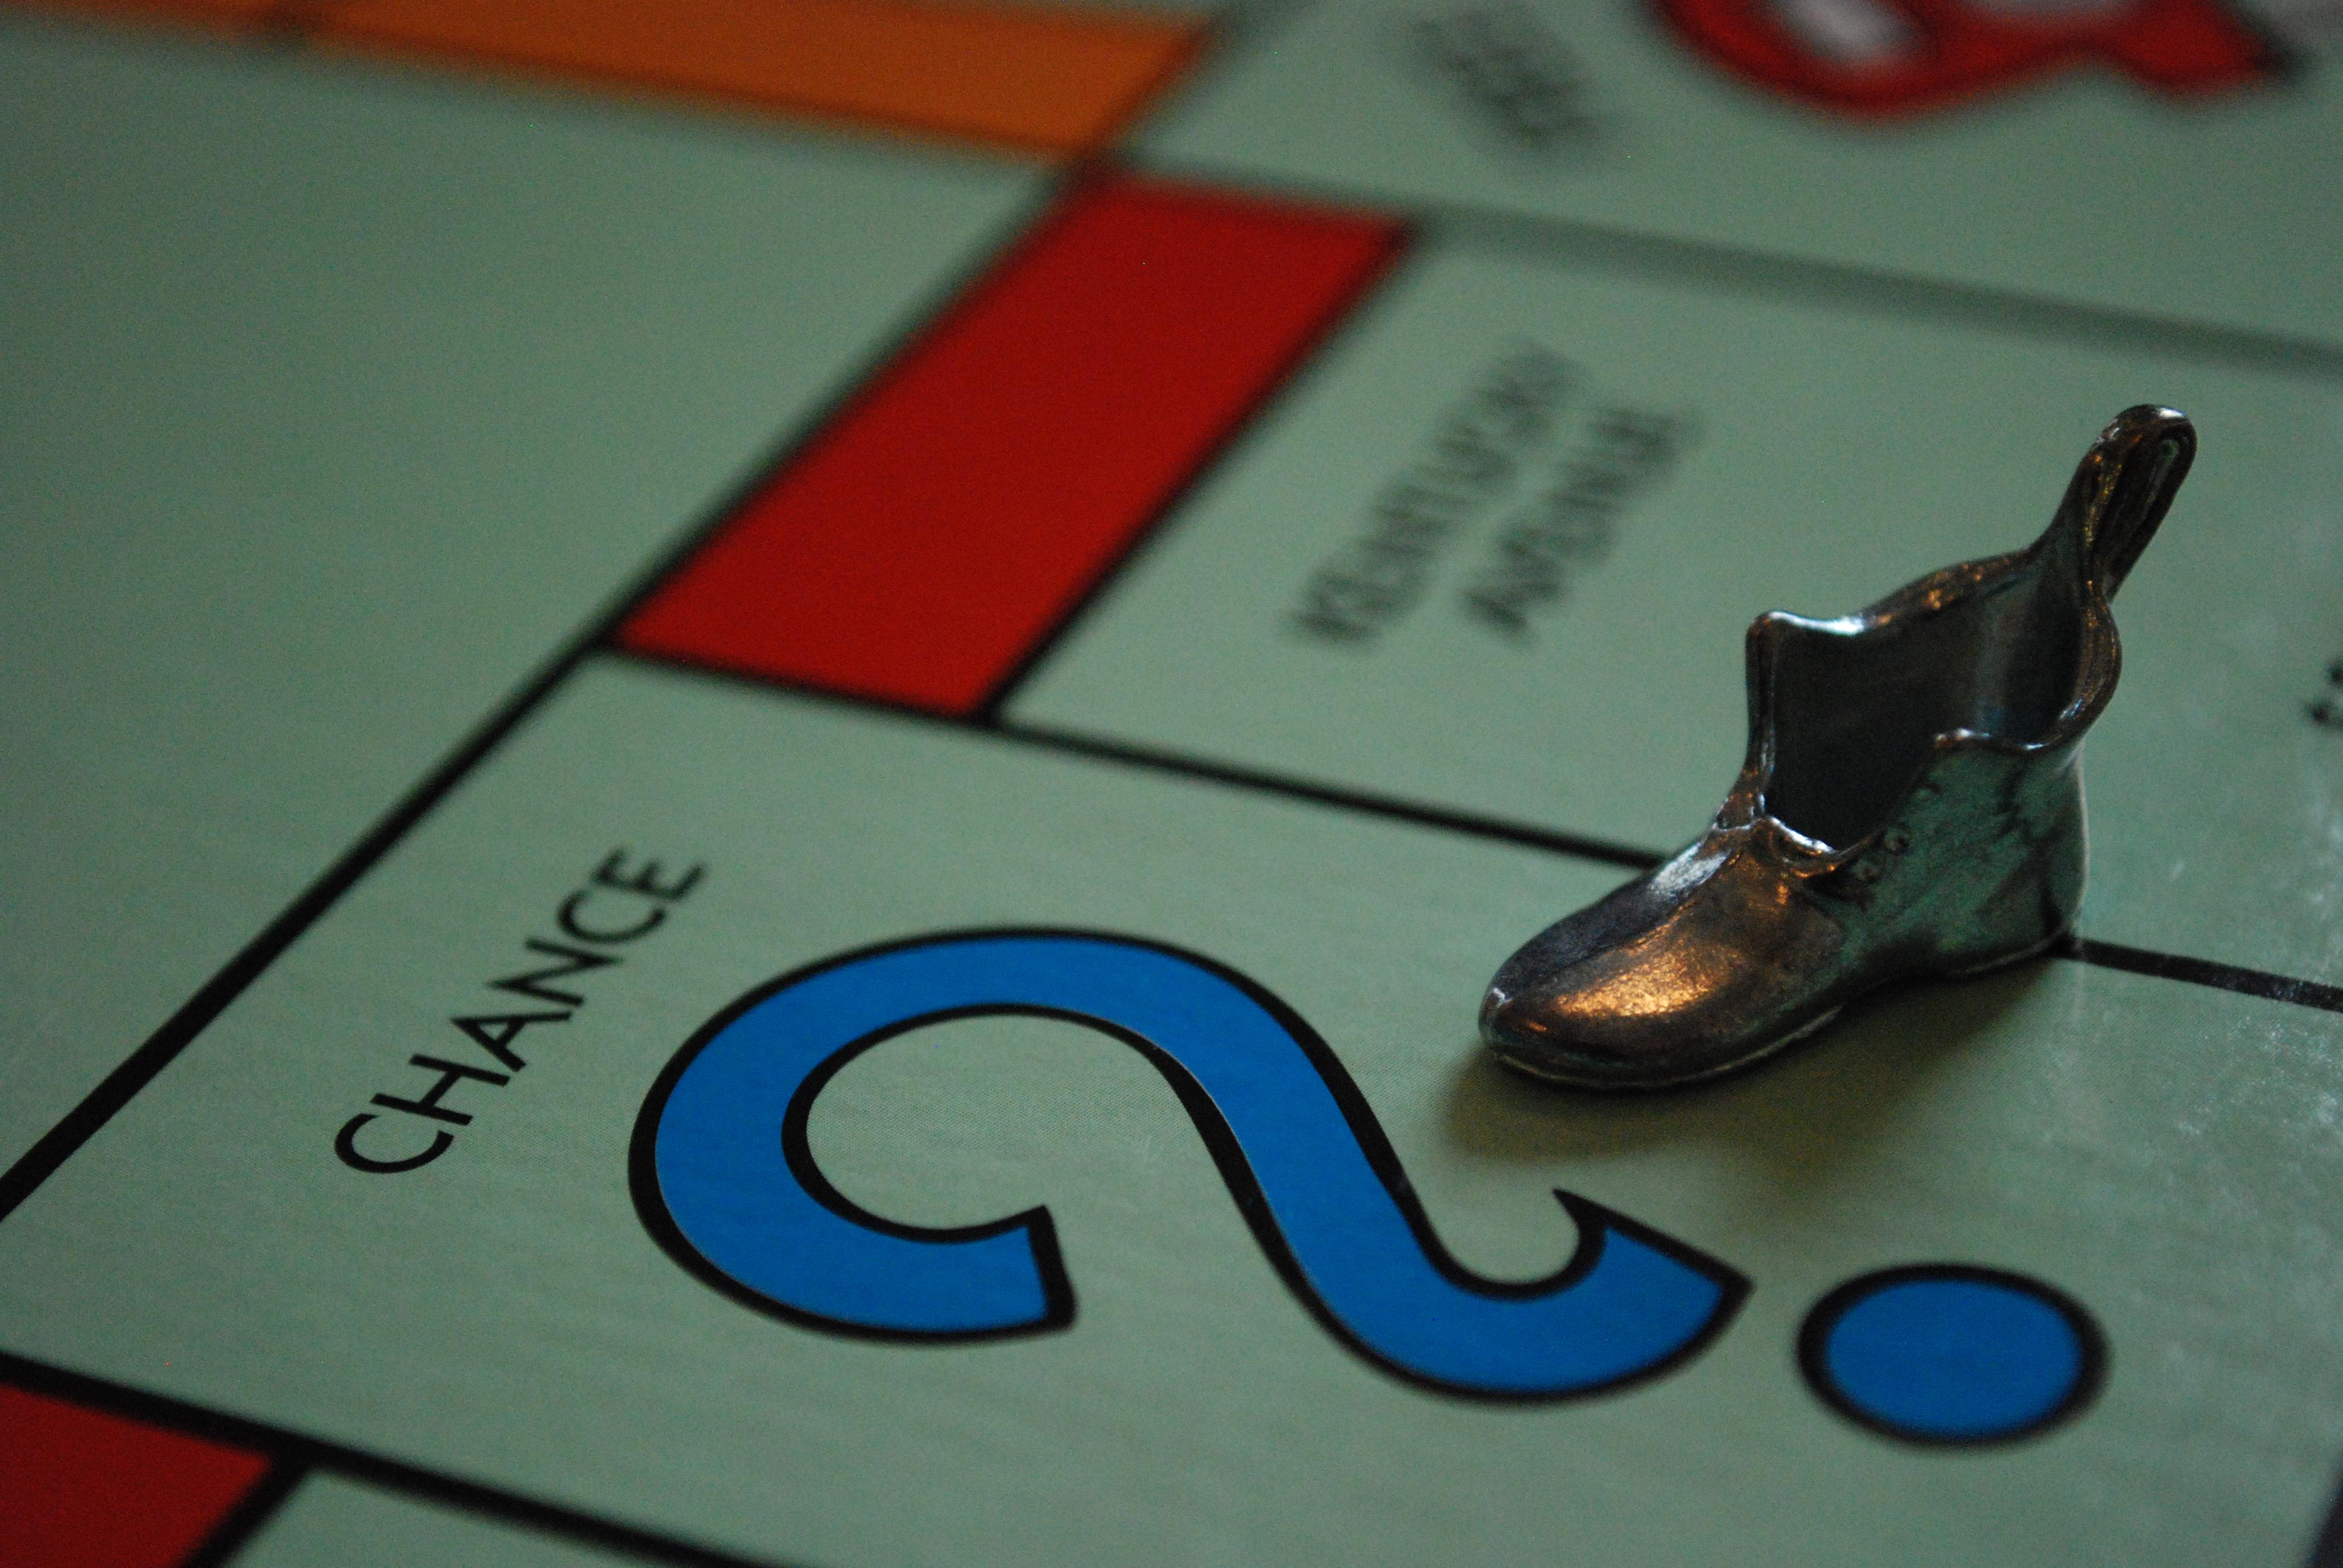 File:Monopoly chance landing (8972965067).jpg - Wikimedia Commons